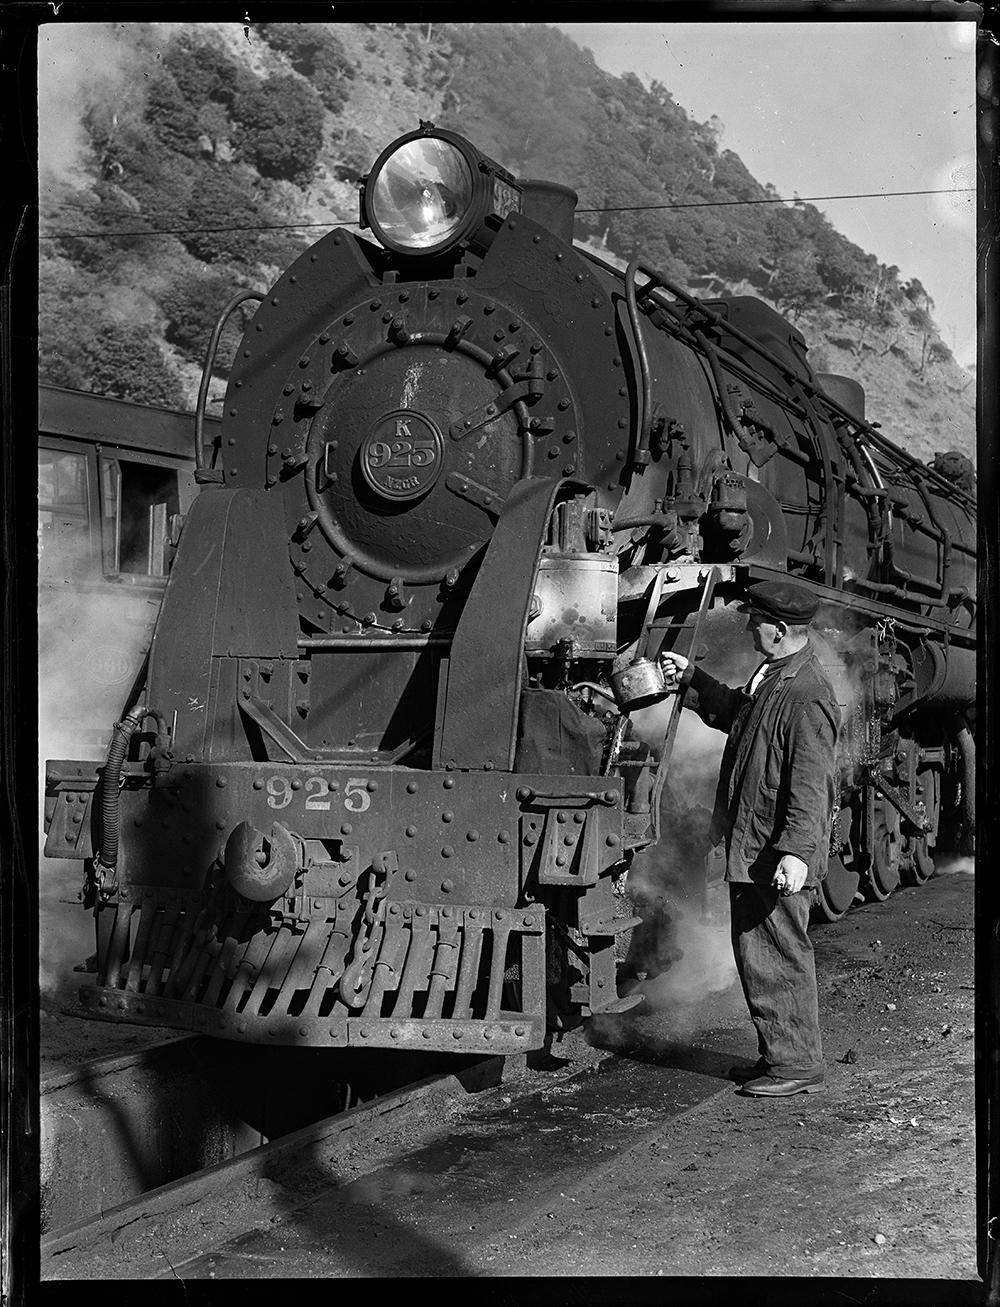 'K' class locomotive number 925 at Paekakariki Locomotive Depot